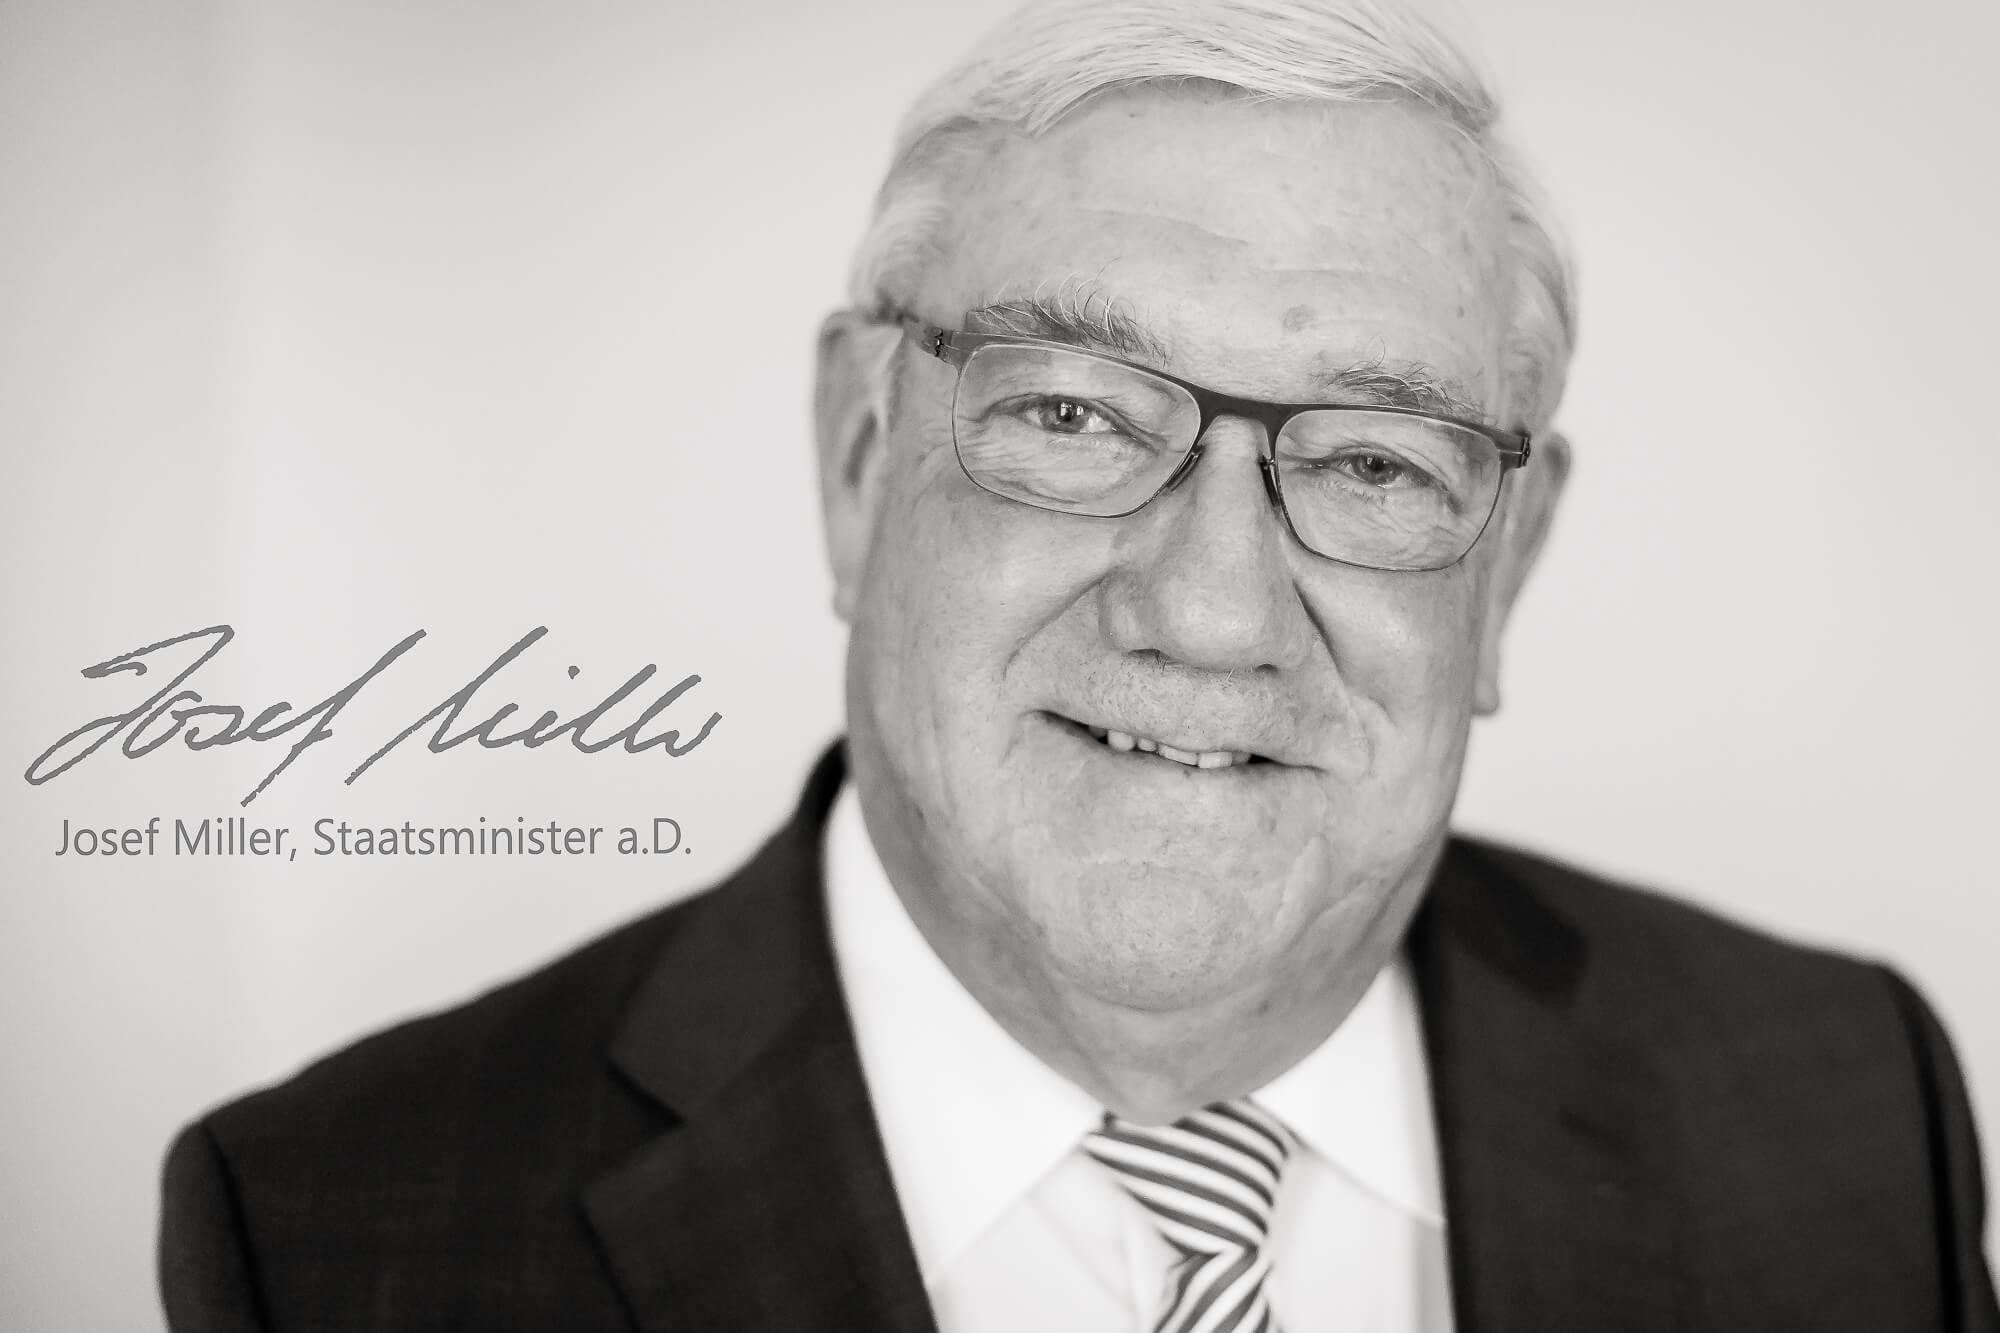 Josef Miller, Staatsminister in Bayern fotografiert von Matthias Baumgartner